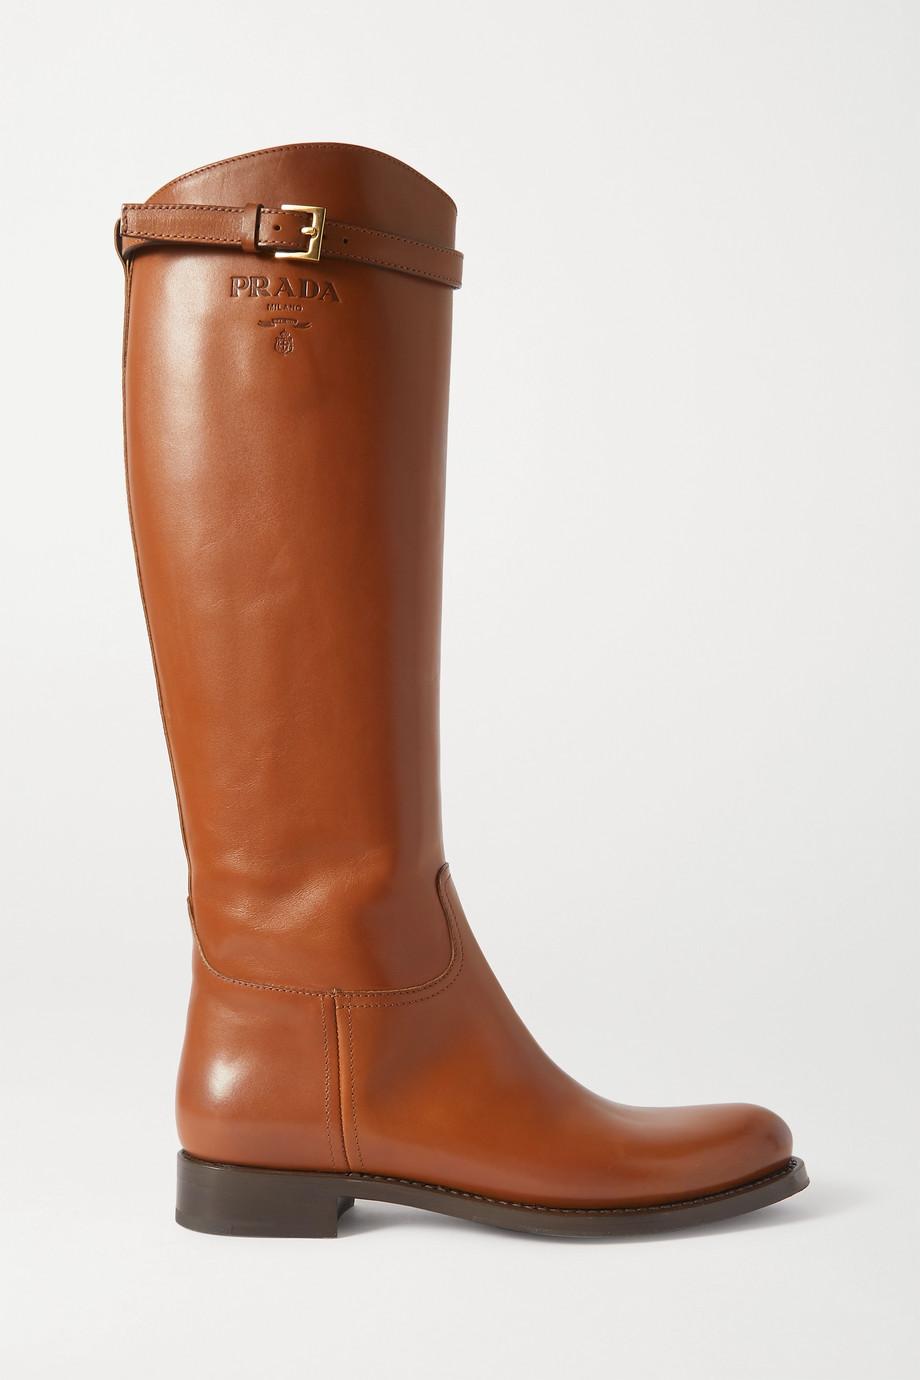 Prada 30 logo-embossed leather knee boots